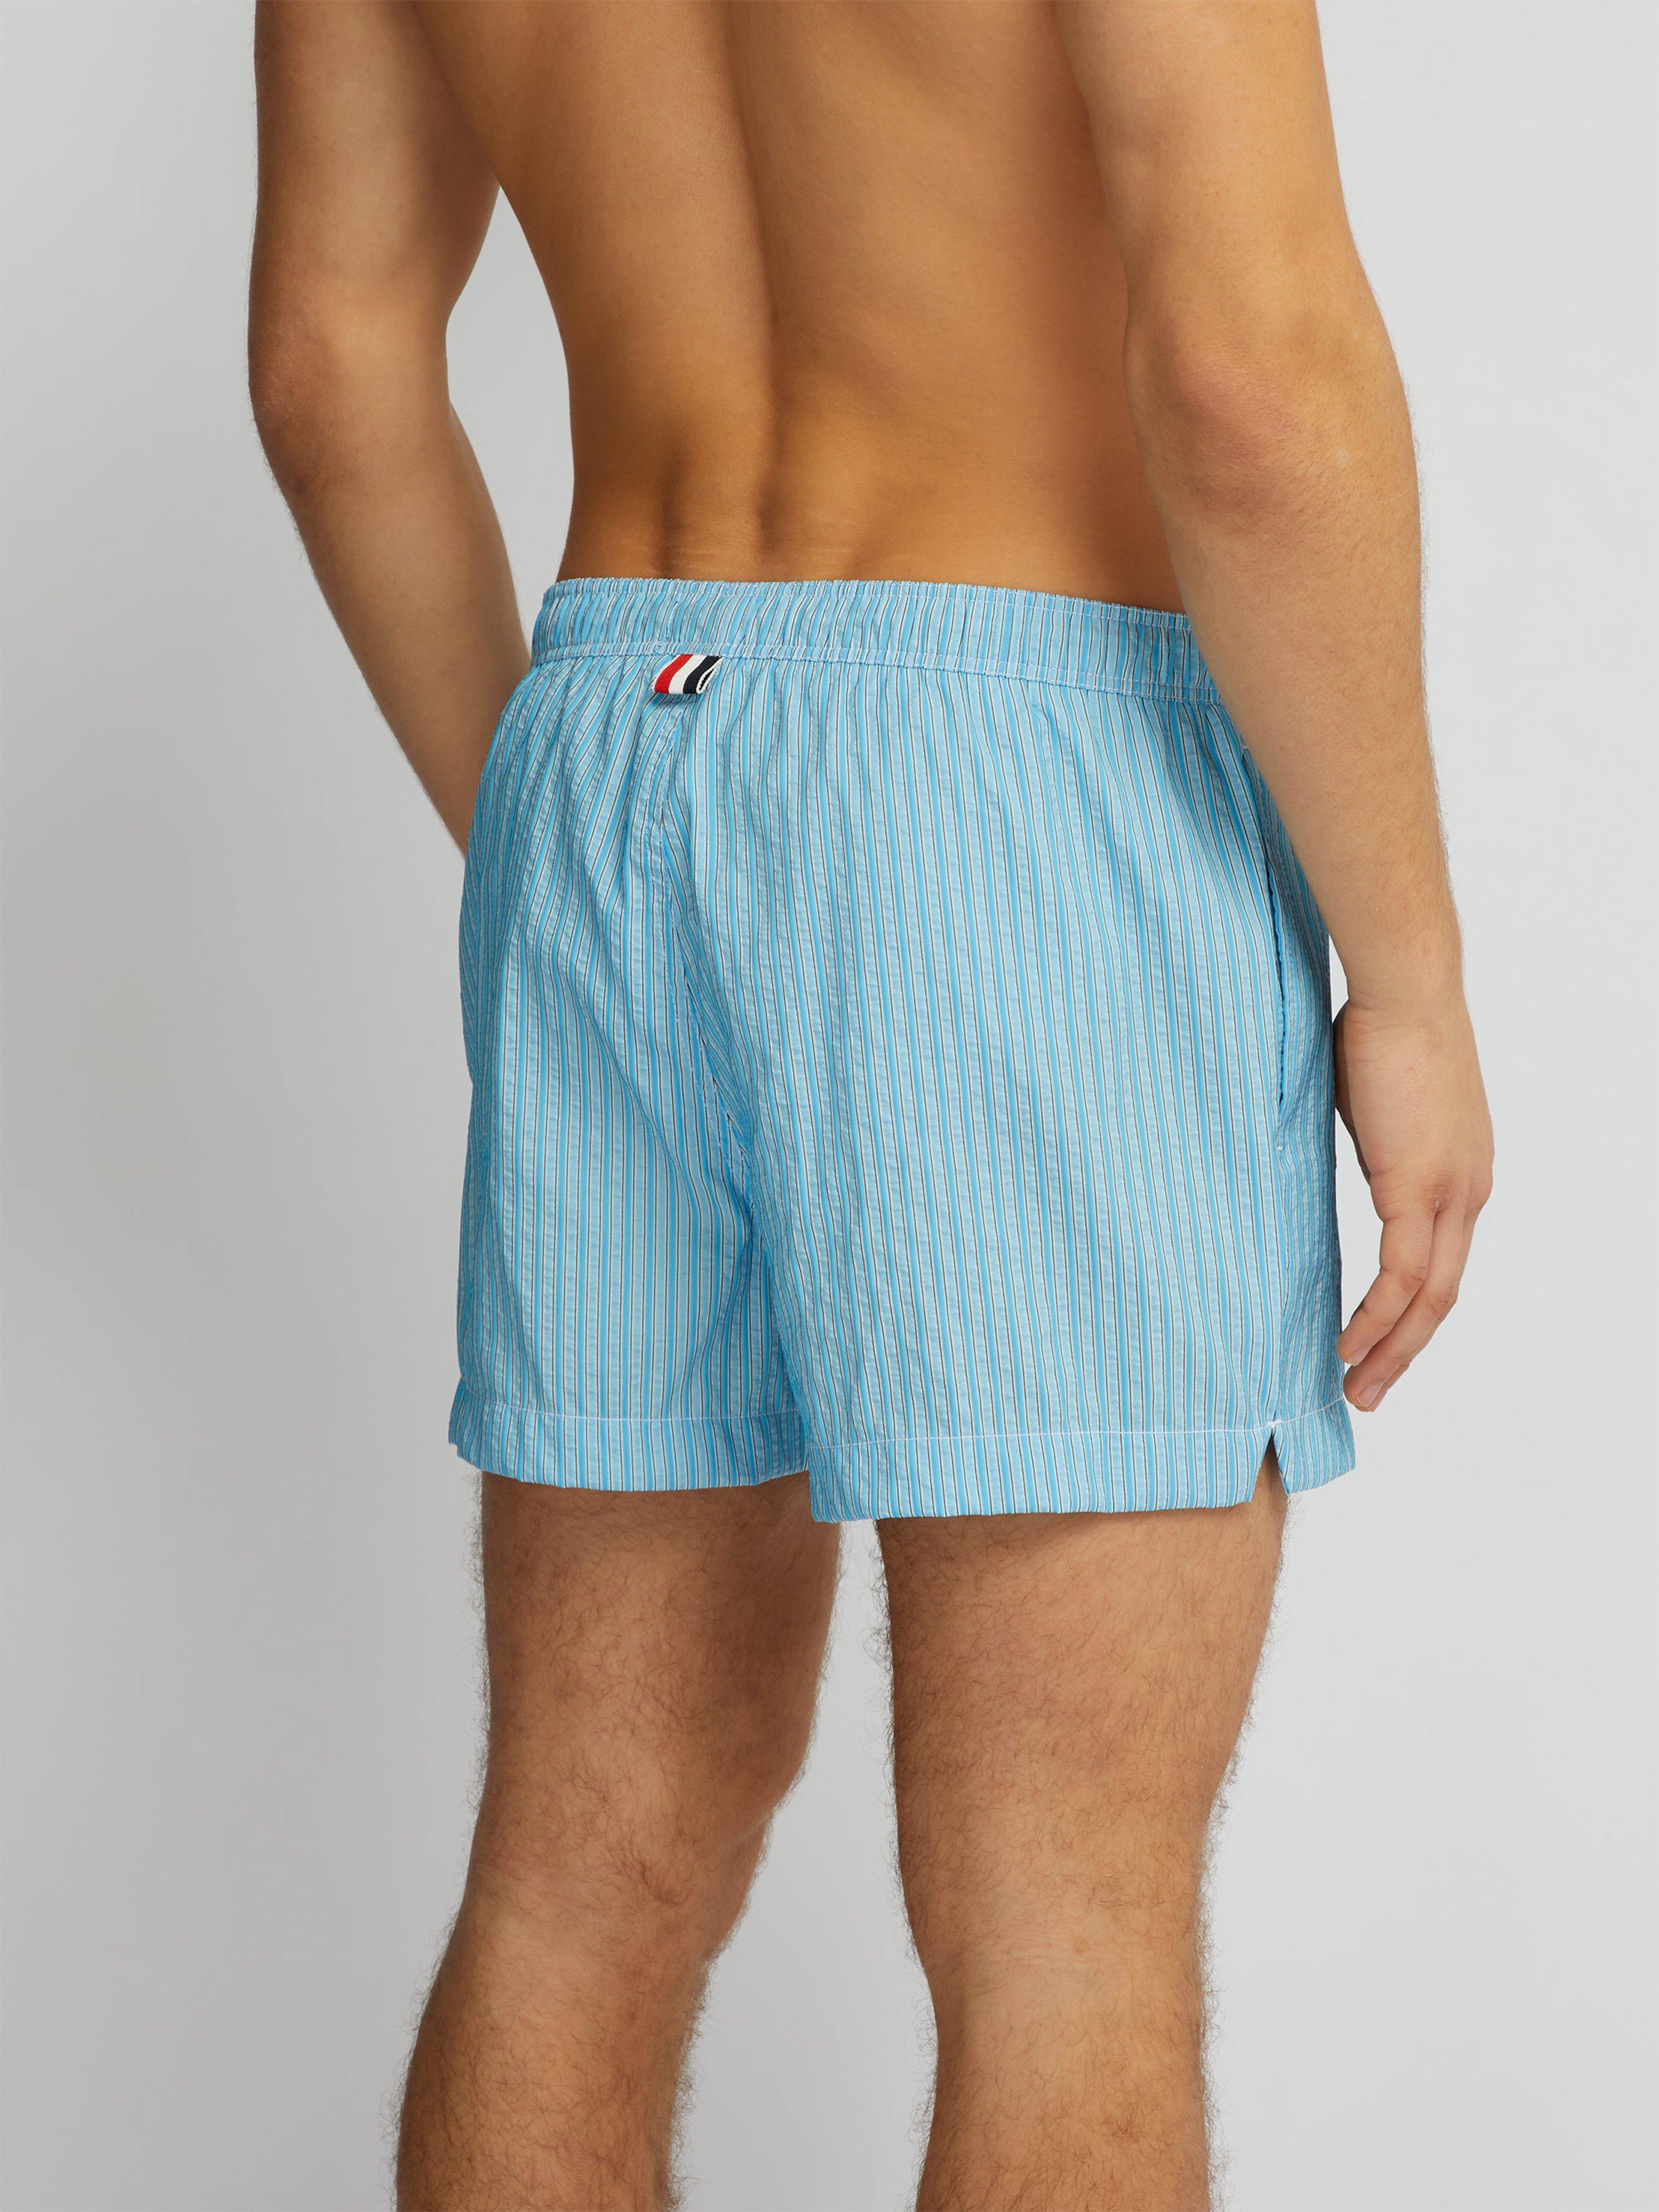 7ec0729a3e3ea Thom Browne - Blue Logo Patch Striped Seersucker Swim Shorts for Men -  Lyst. View fullscreen